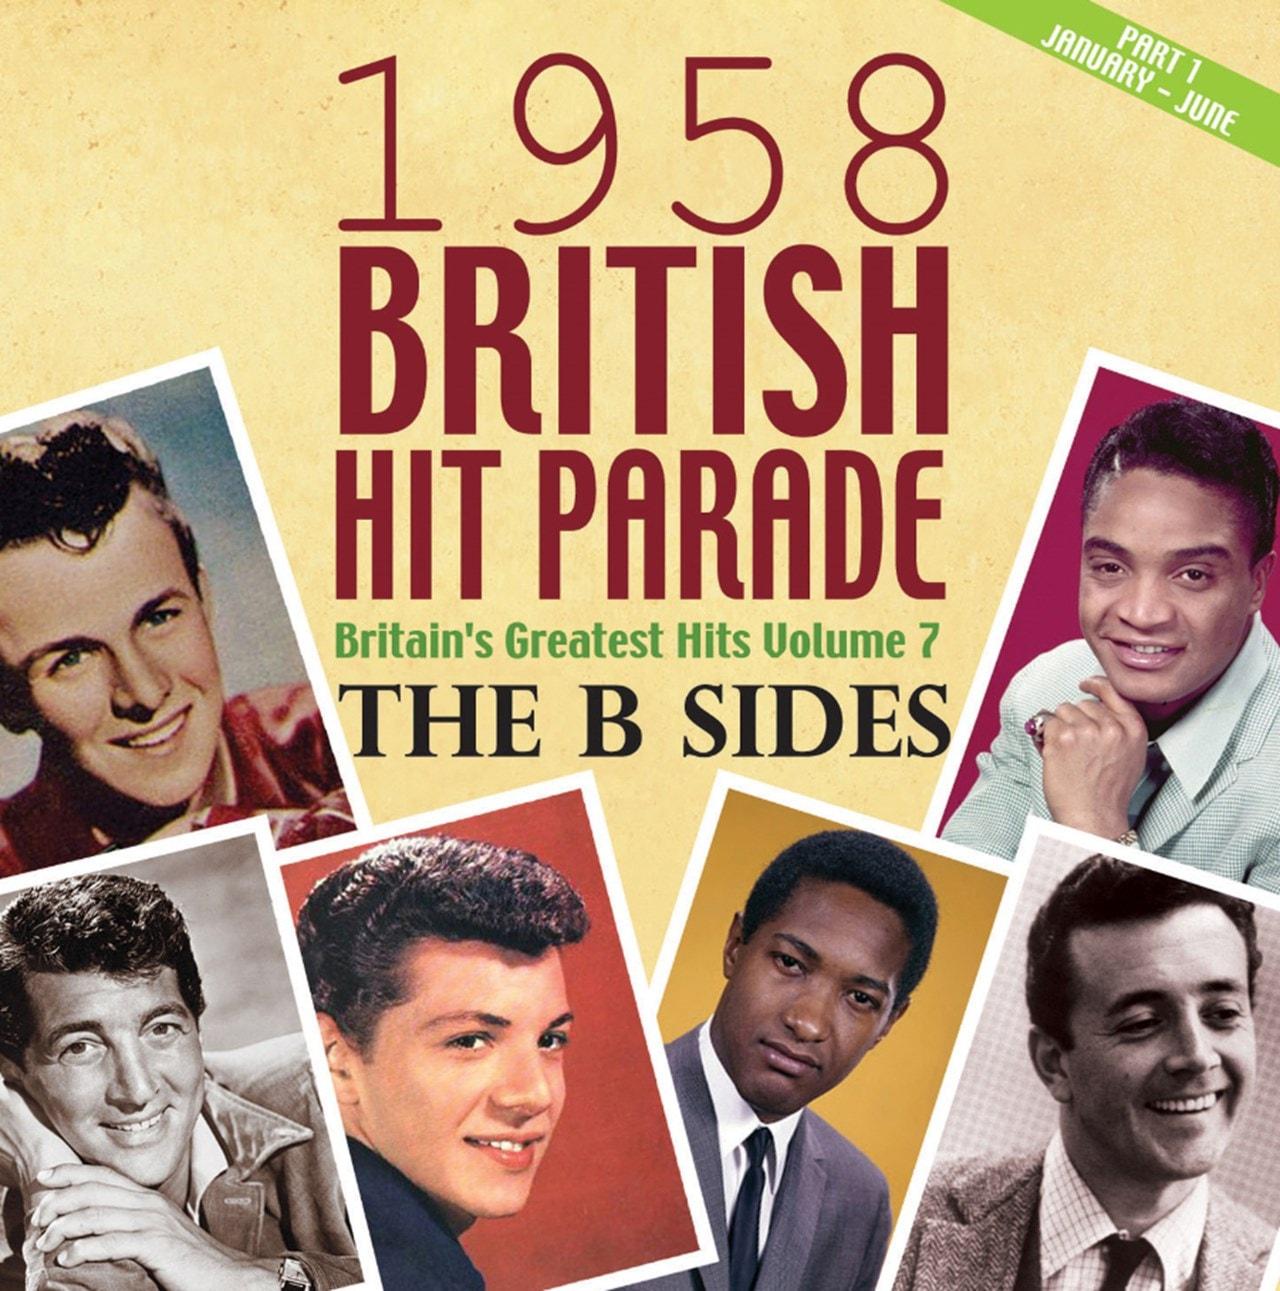 1958 British Hit Parade: The B Sides - Volume 1 - 1